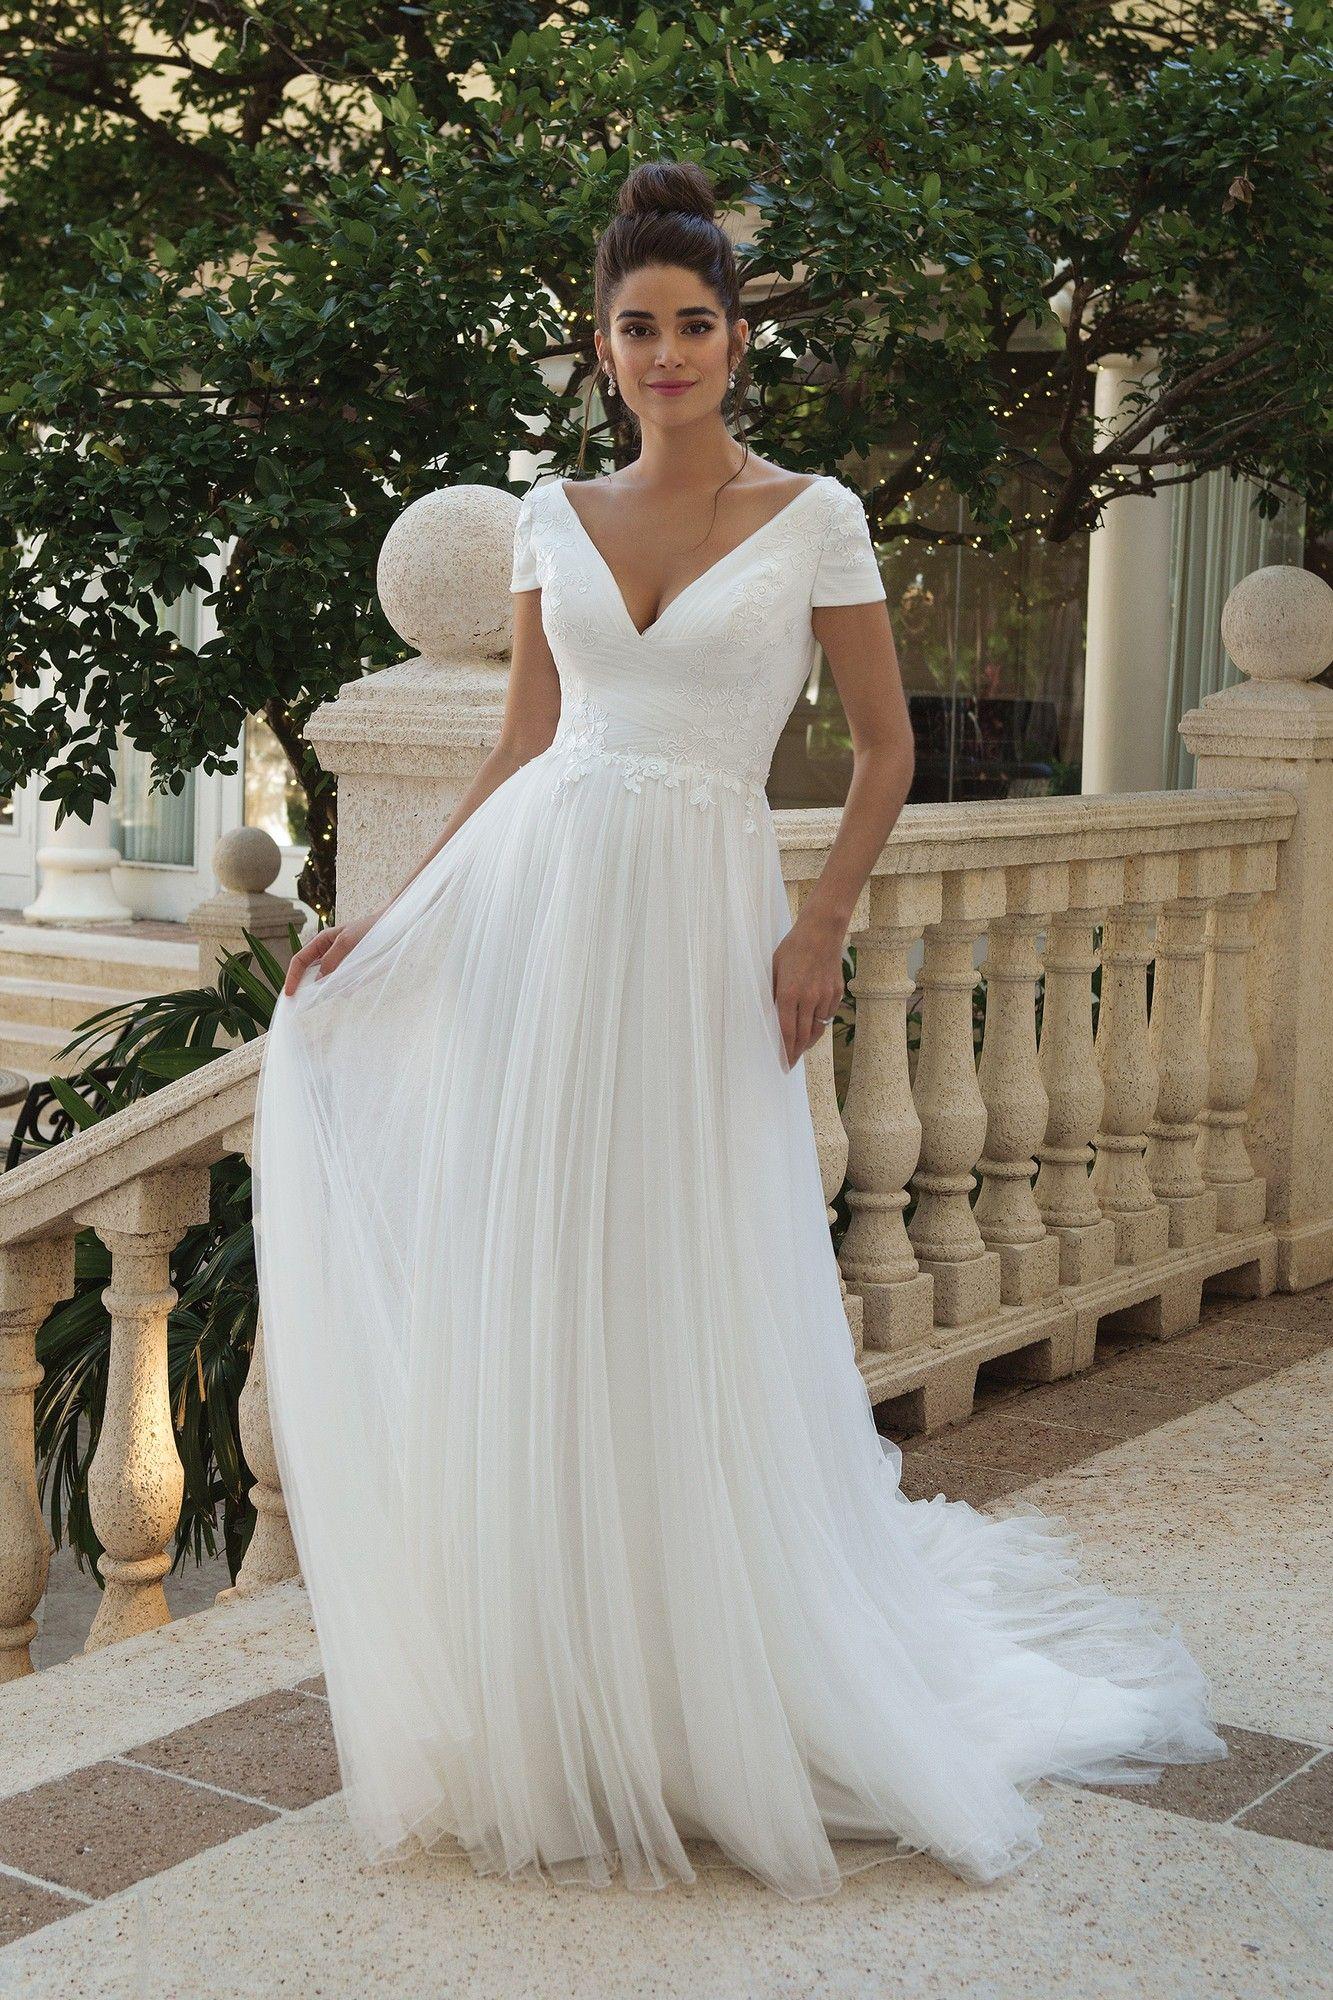 Sincerity Bridal Wedding Dresses, Sincerity Bridal Photos